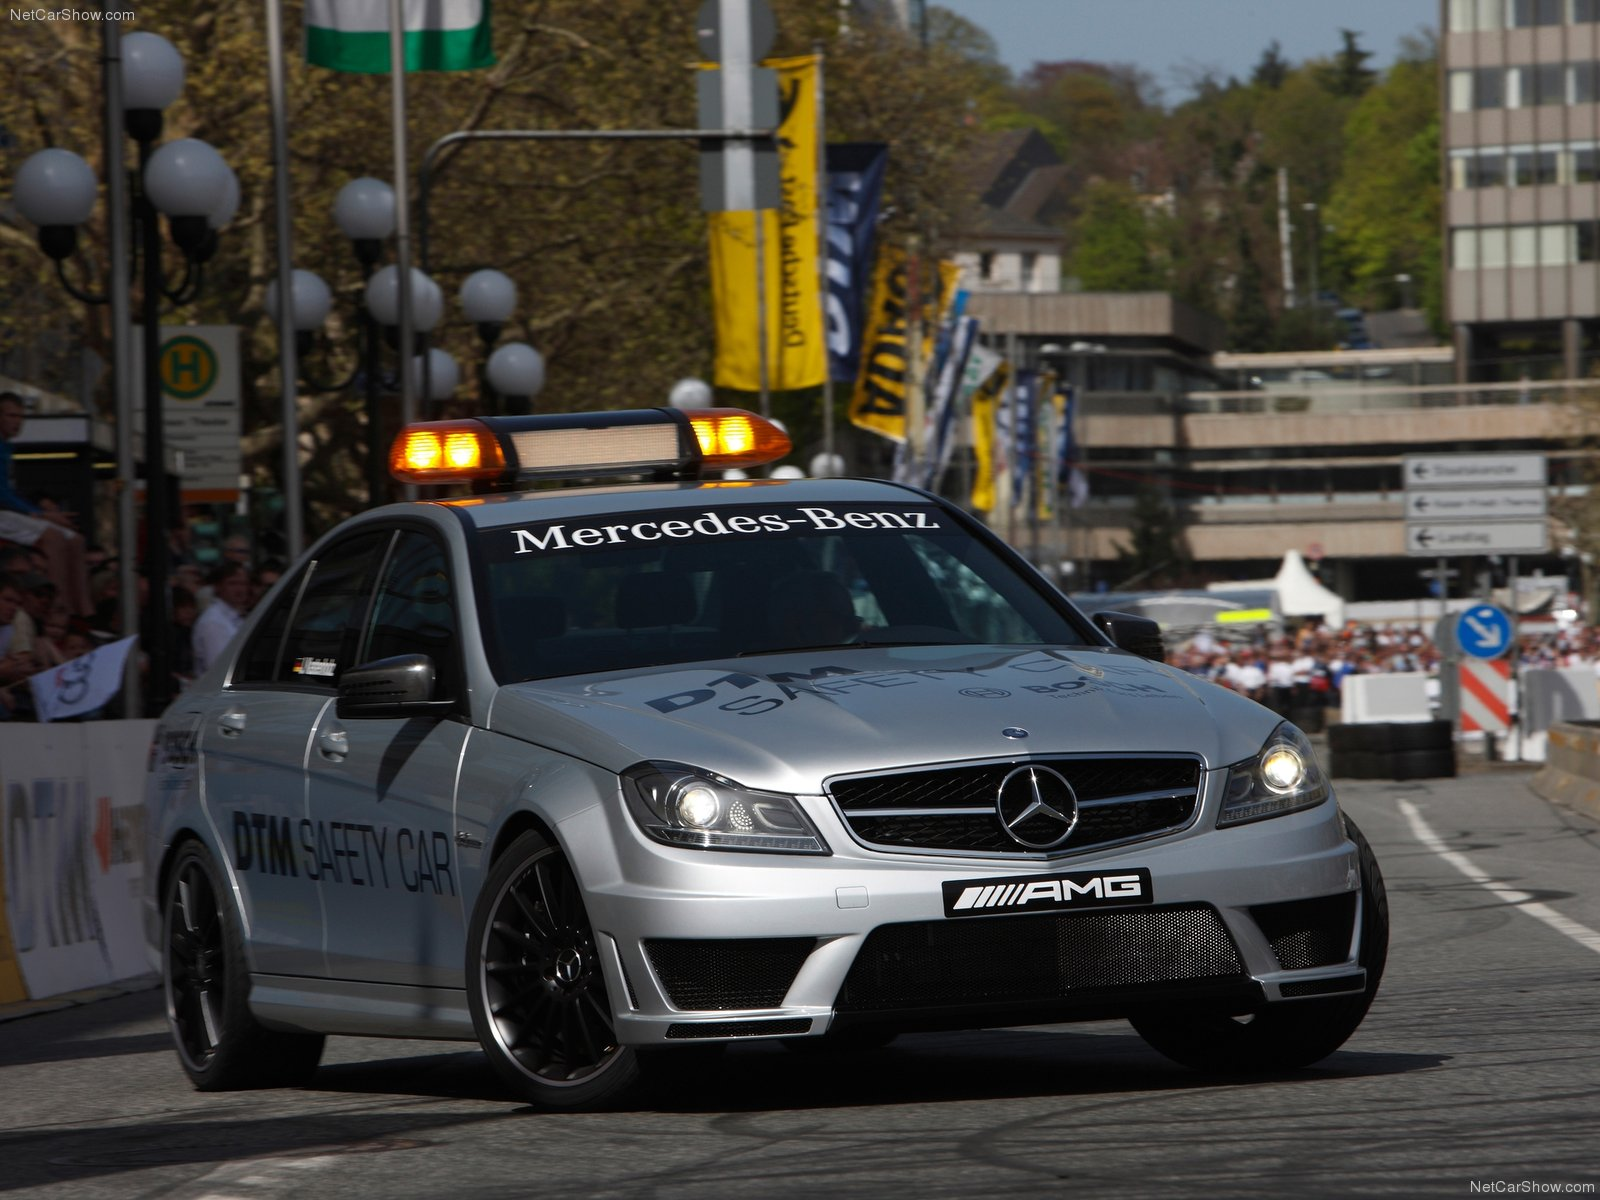 Mercedes benz c63 amg dtm safety car picture 80461 for Mercedes benz safety